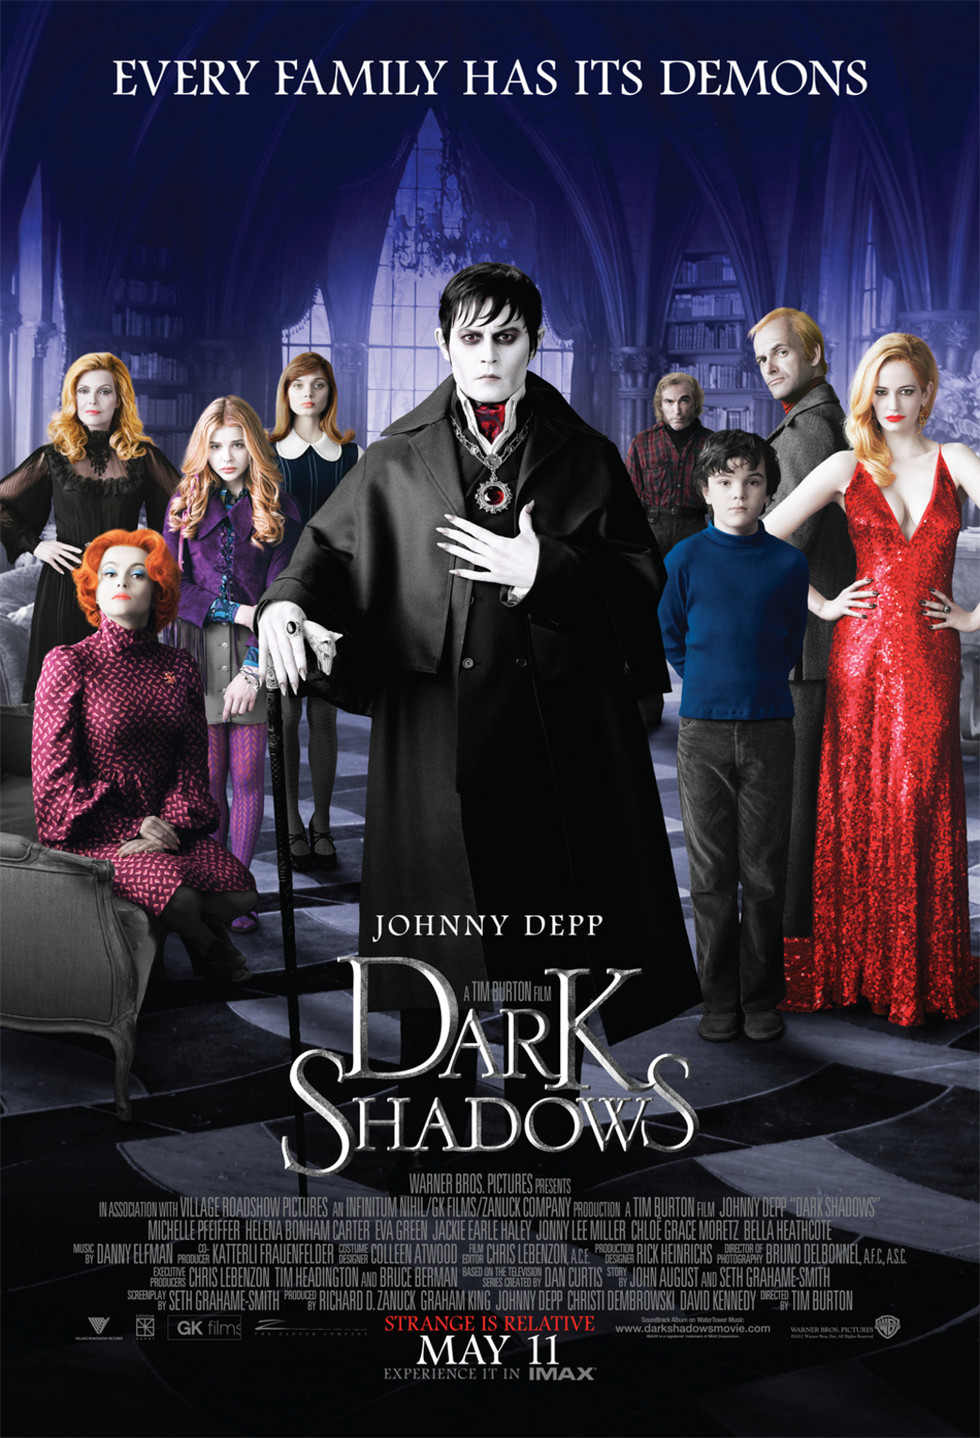 Dark Shadows - Movie Poster #1 (Large)